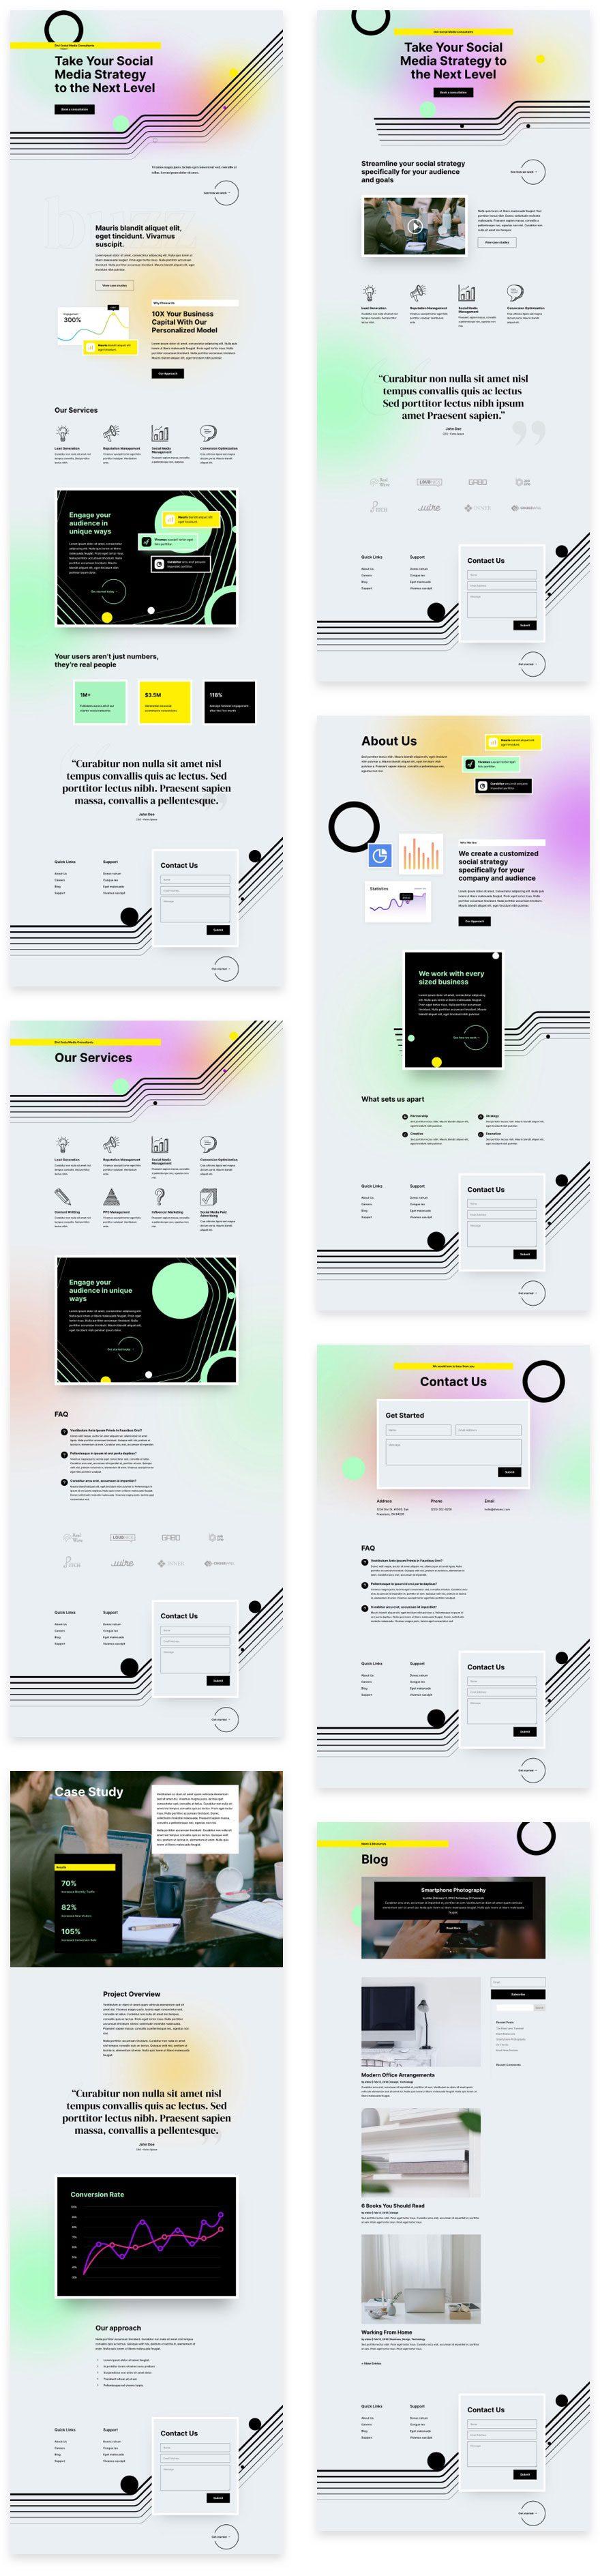 https://www.elegantthemes.com/blog/wp-content/uploads/2021/07/divi-social-media-consultant-layout-pack-images.zip